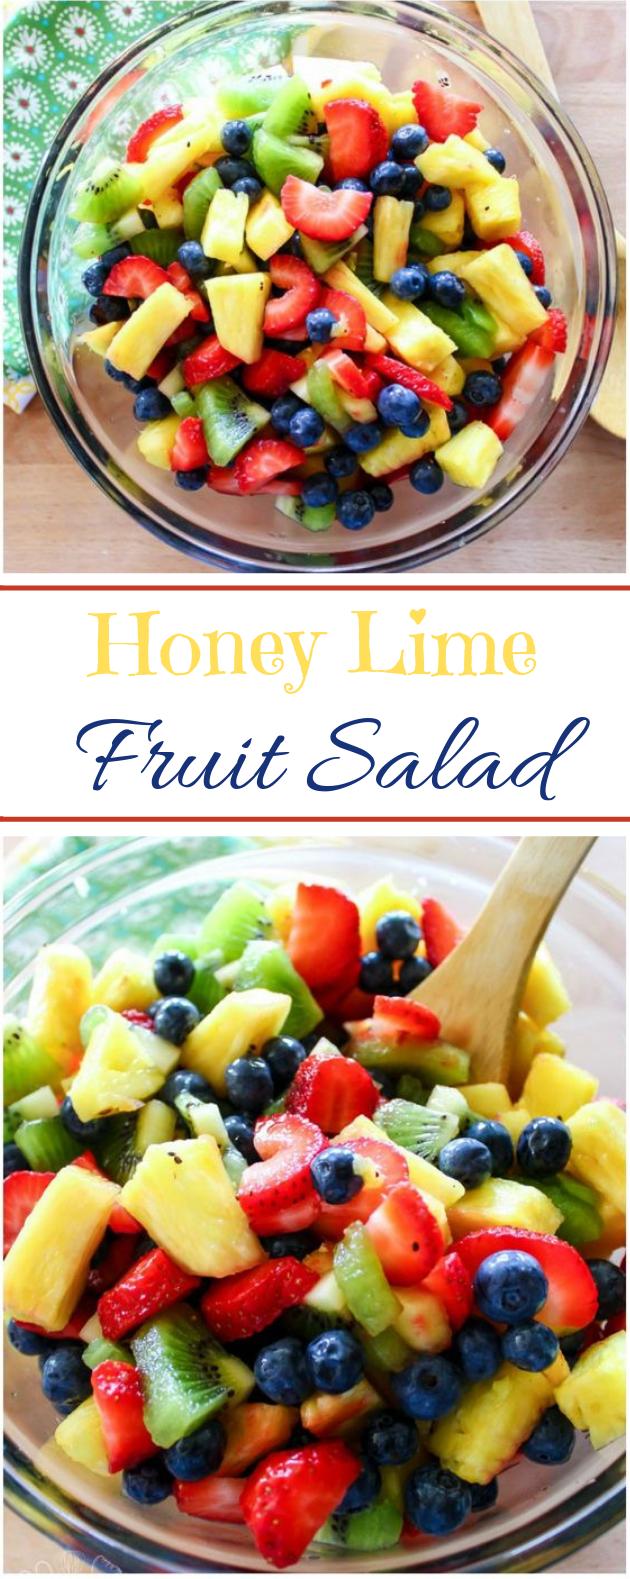 Honey Lime Fruit Salad #vegatarian #salad